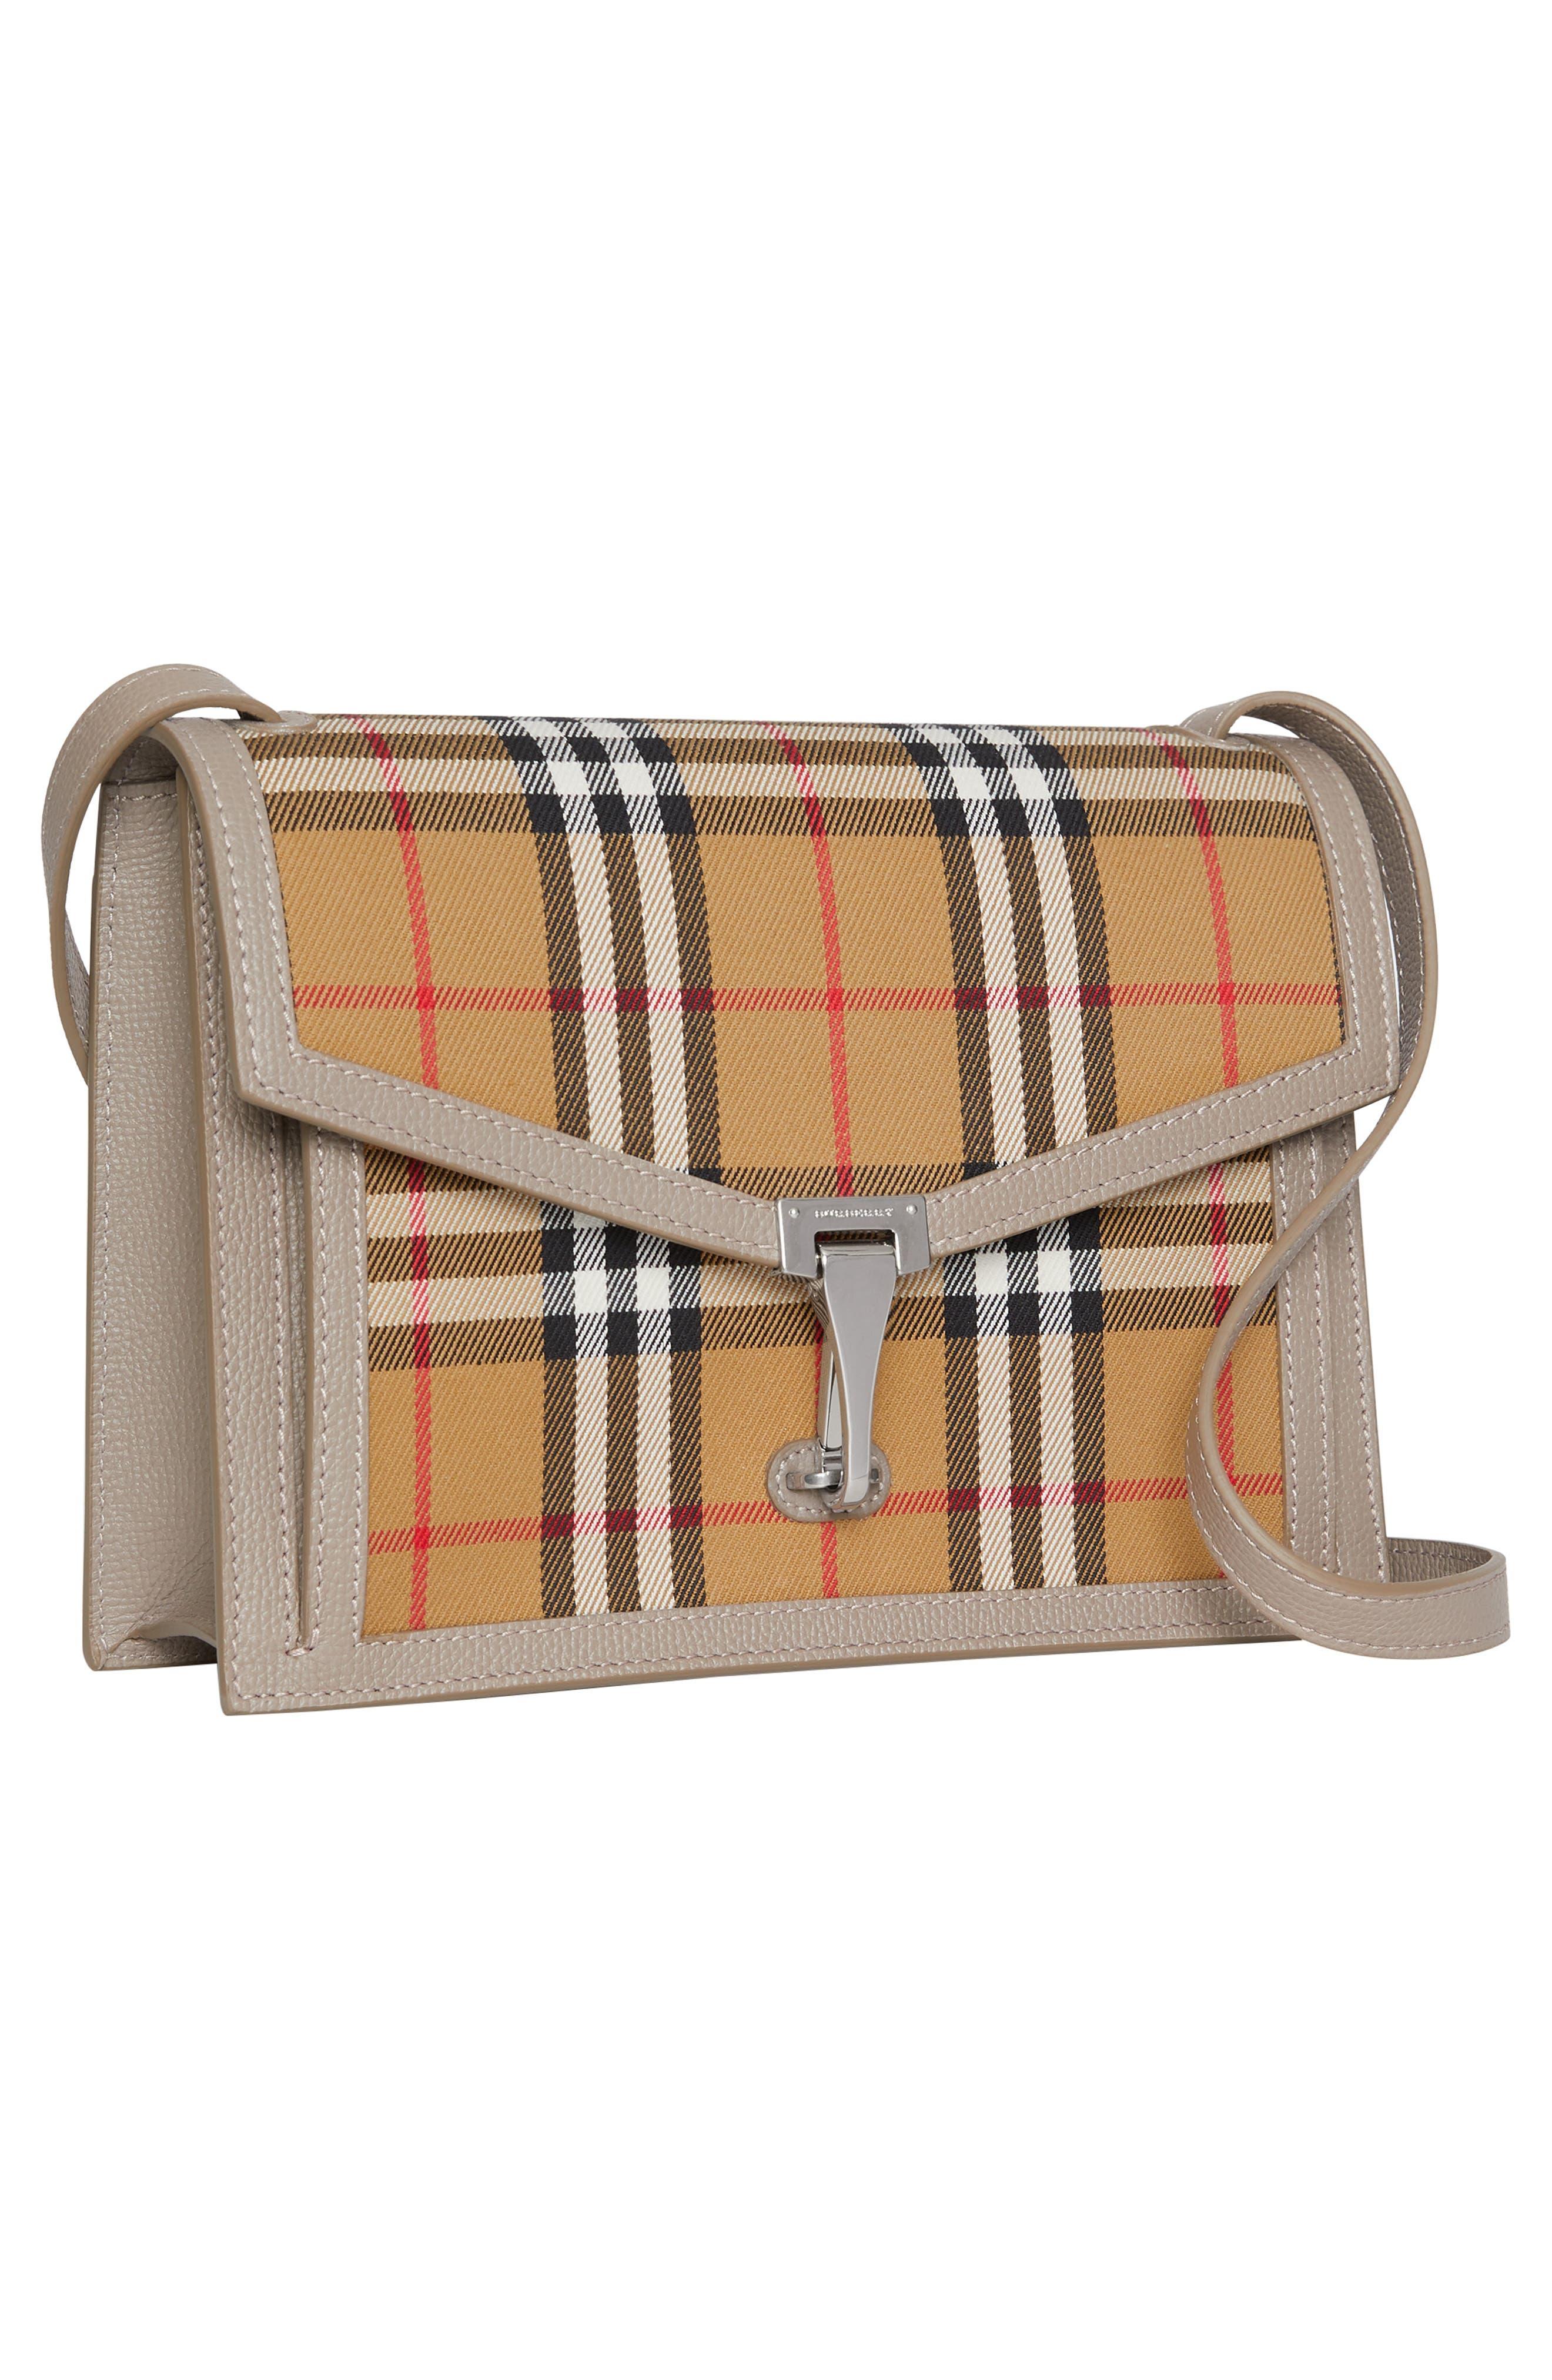 Small Macken Vintage Check Crossbody Bag,                             Alternate thumbnail 7, color,                             TAUPE BROWN